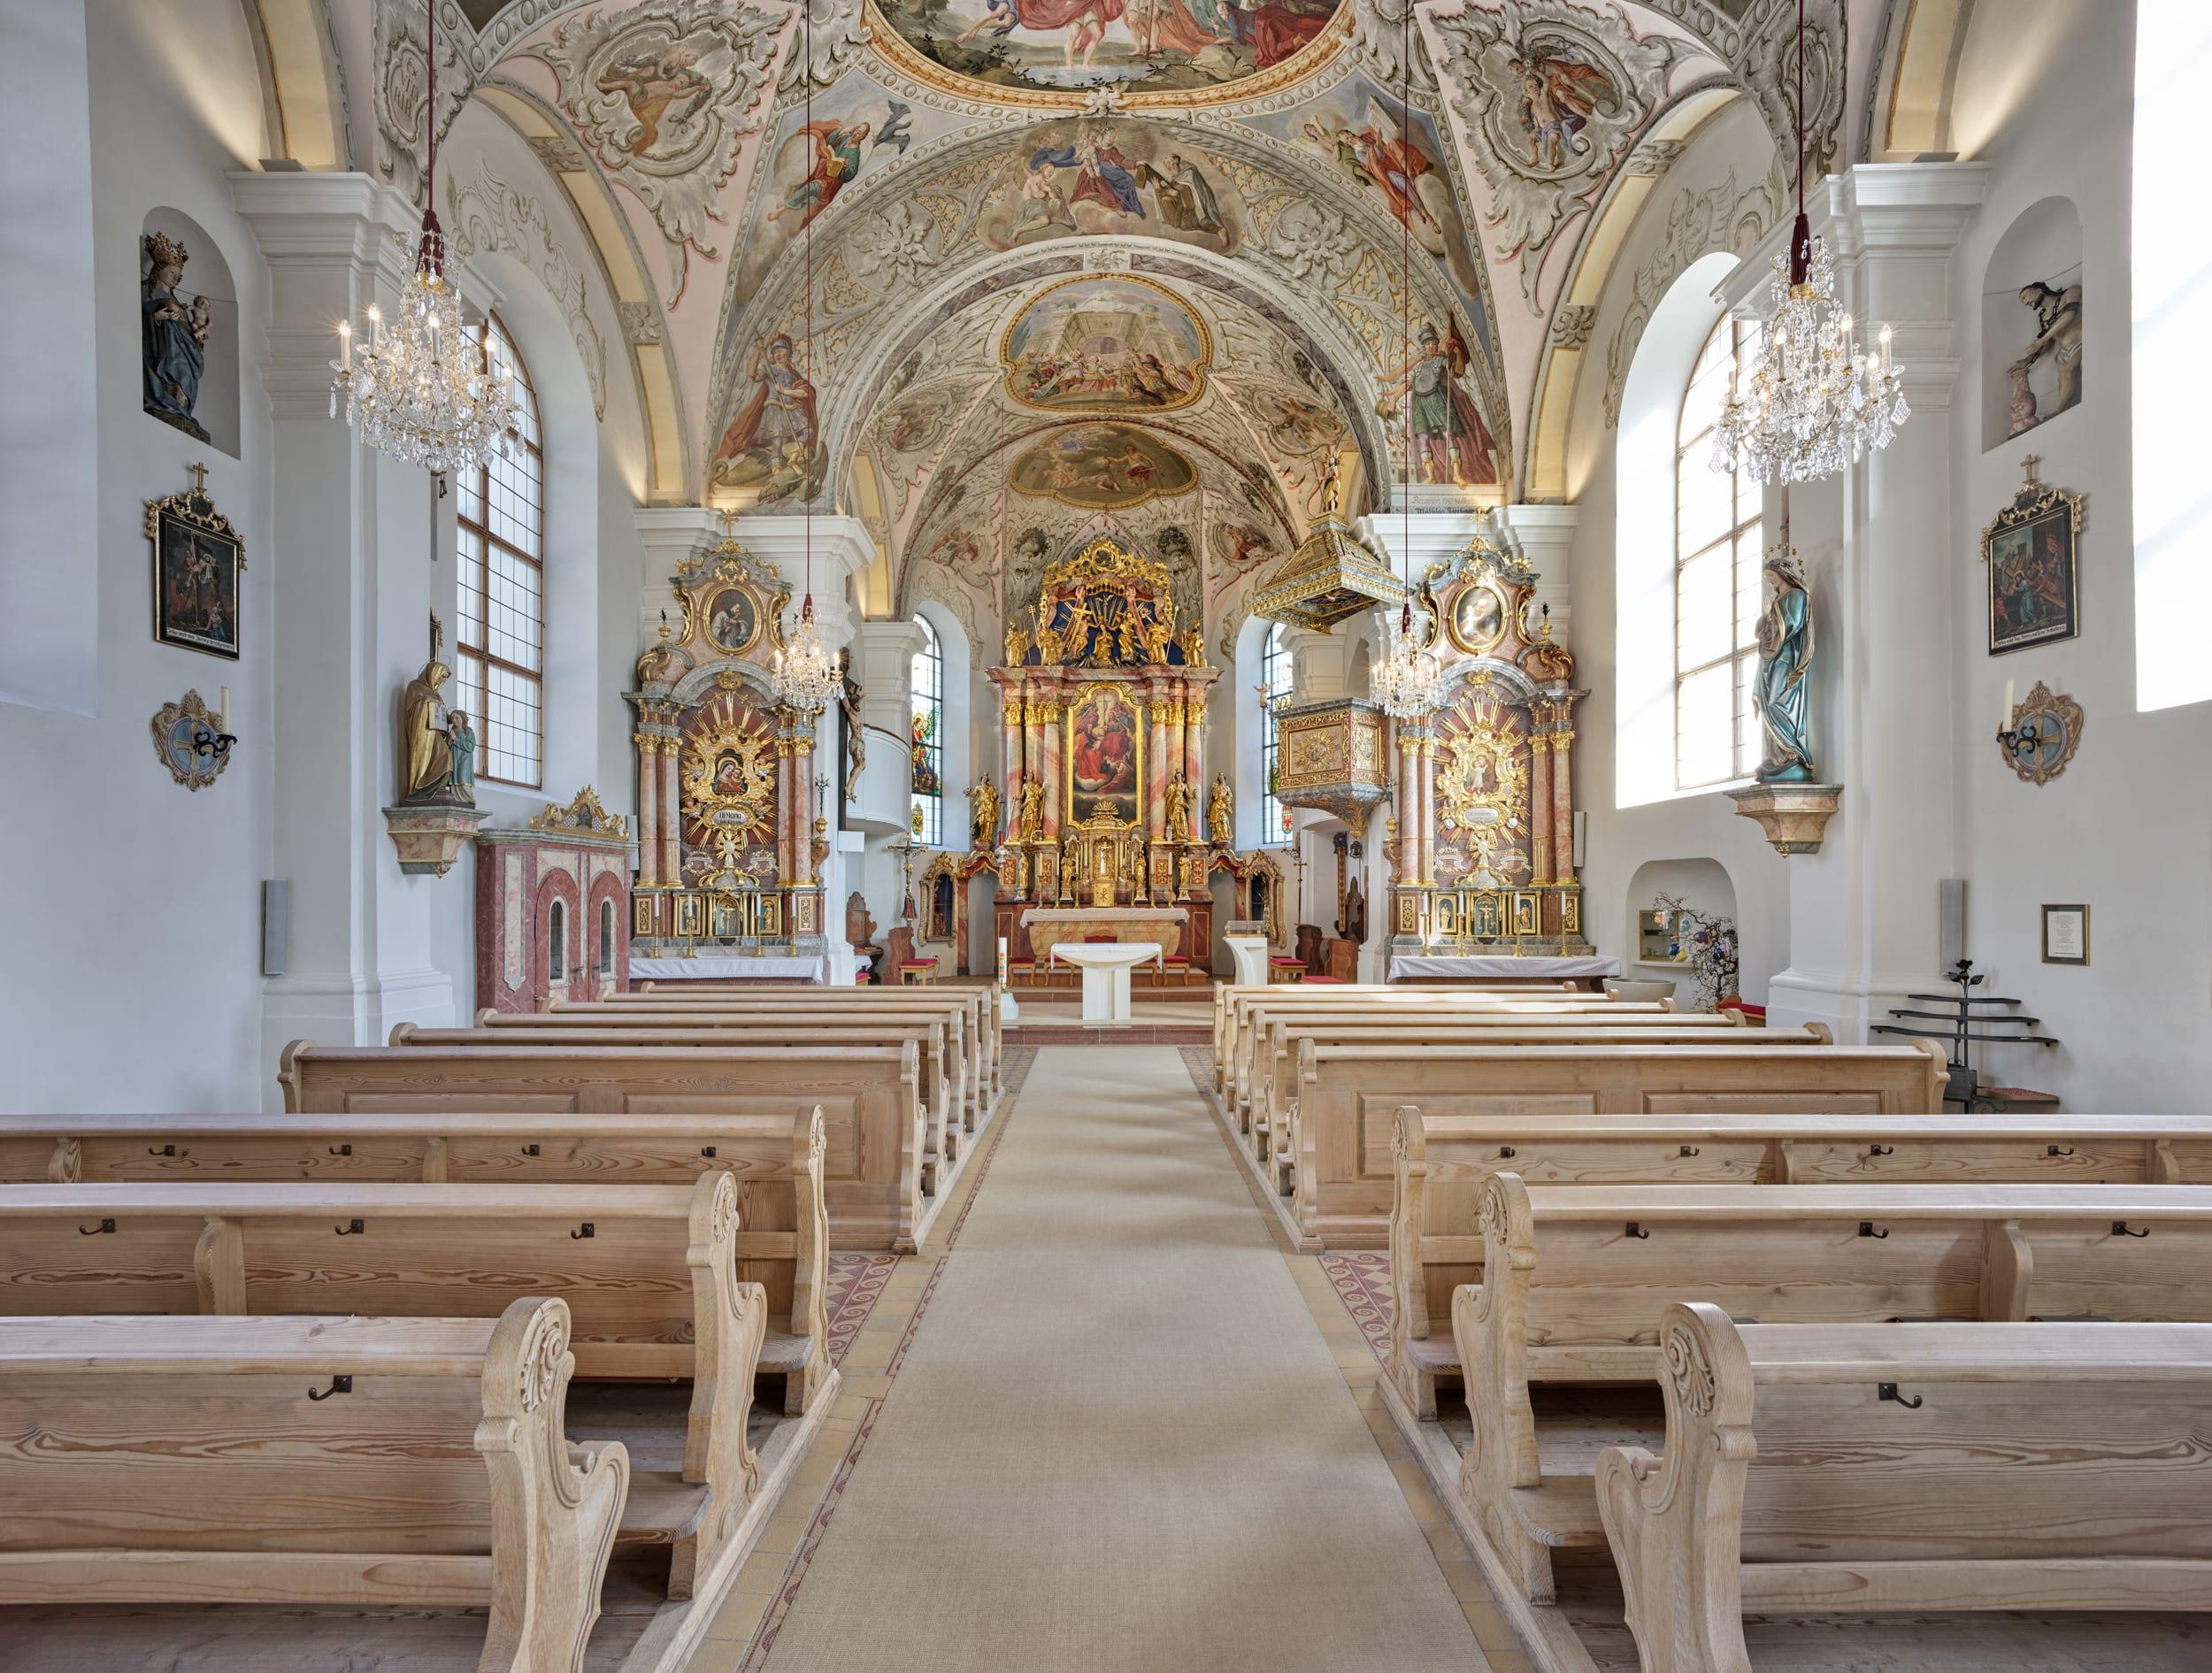 WEB_Scheffau_Wilder_Kaiser_Kirche_Innenanschicht_Fotograf_Gunnar_Menzel